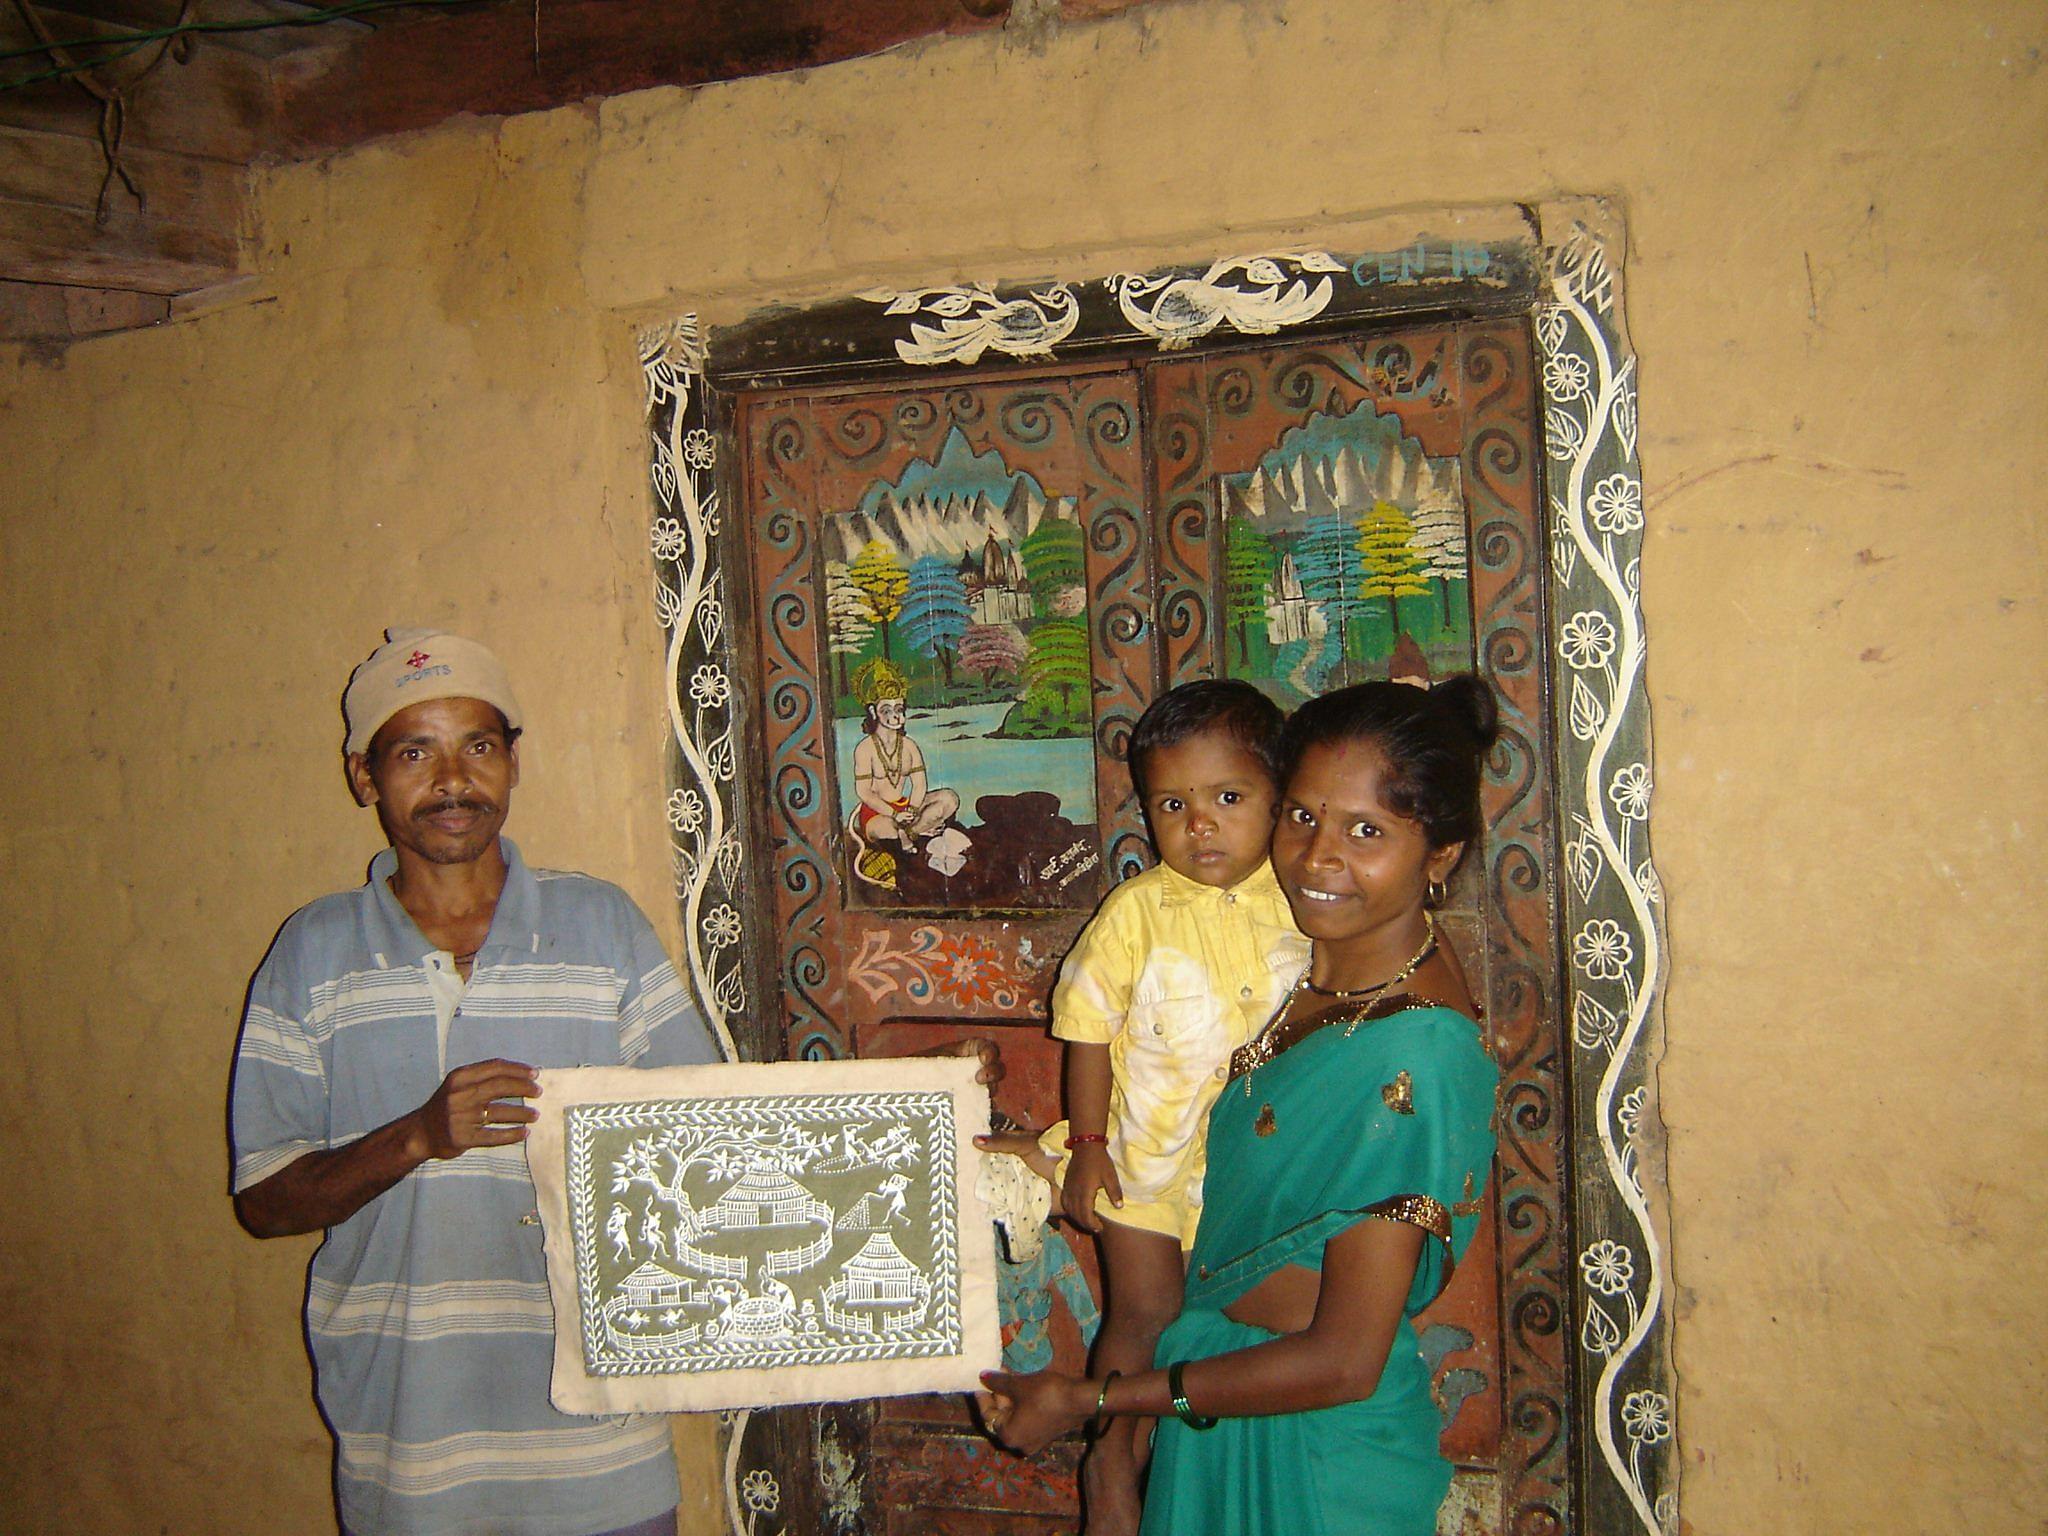 Warli artist Sadanand and his wife.